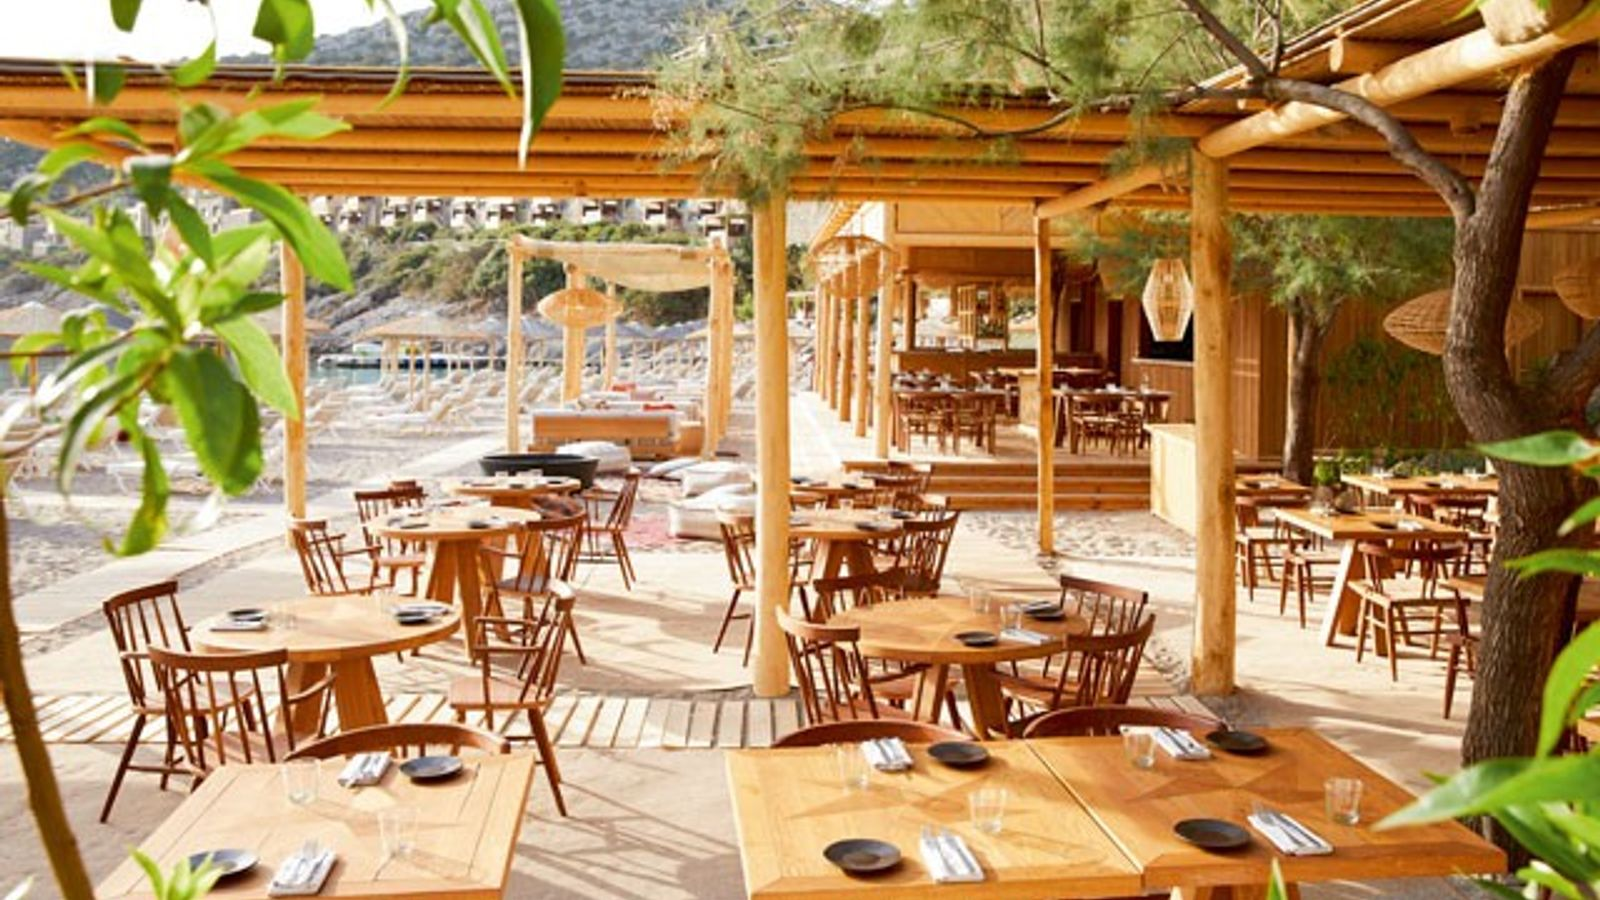 The BeachHouse restaurant